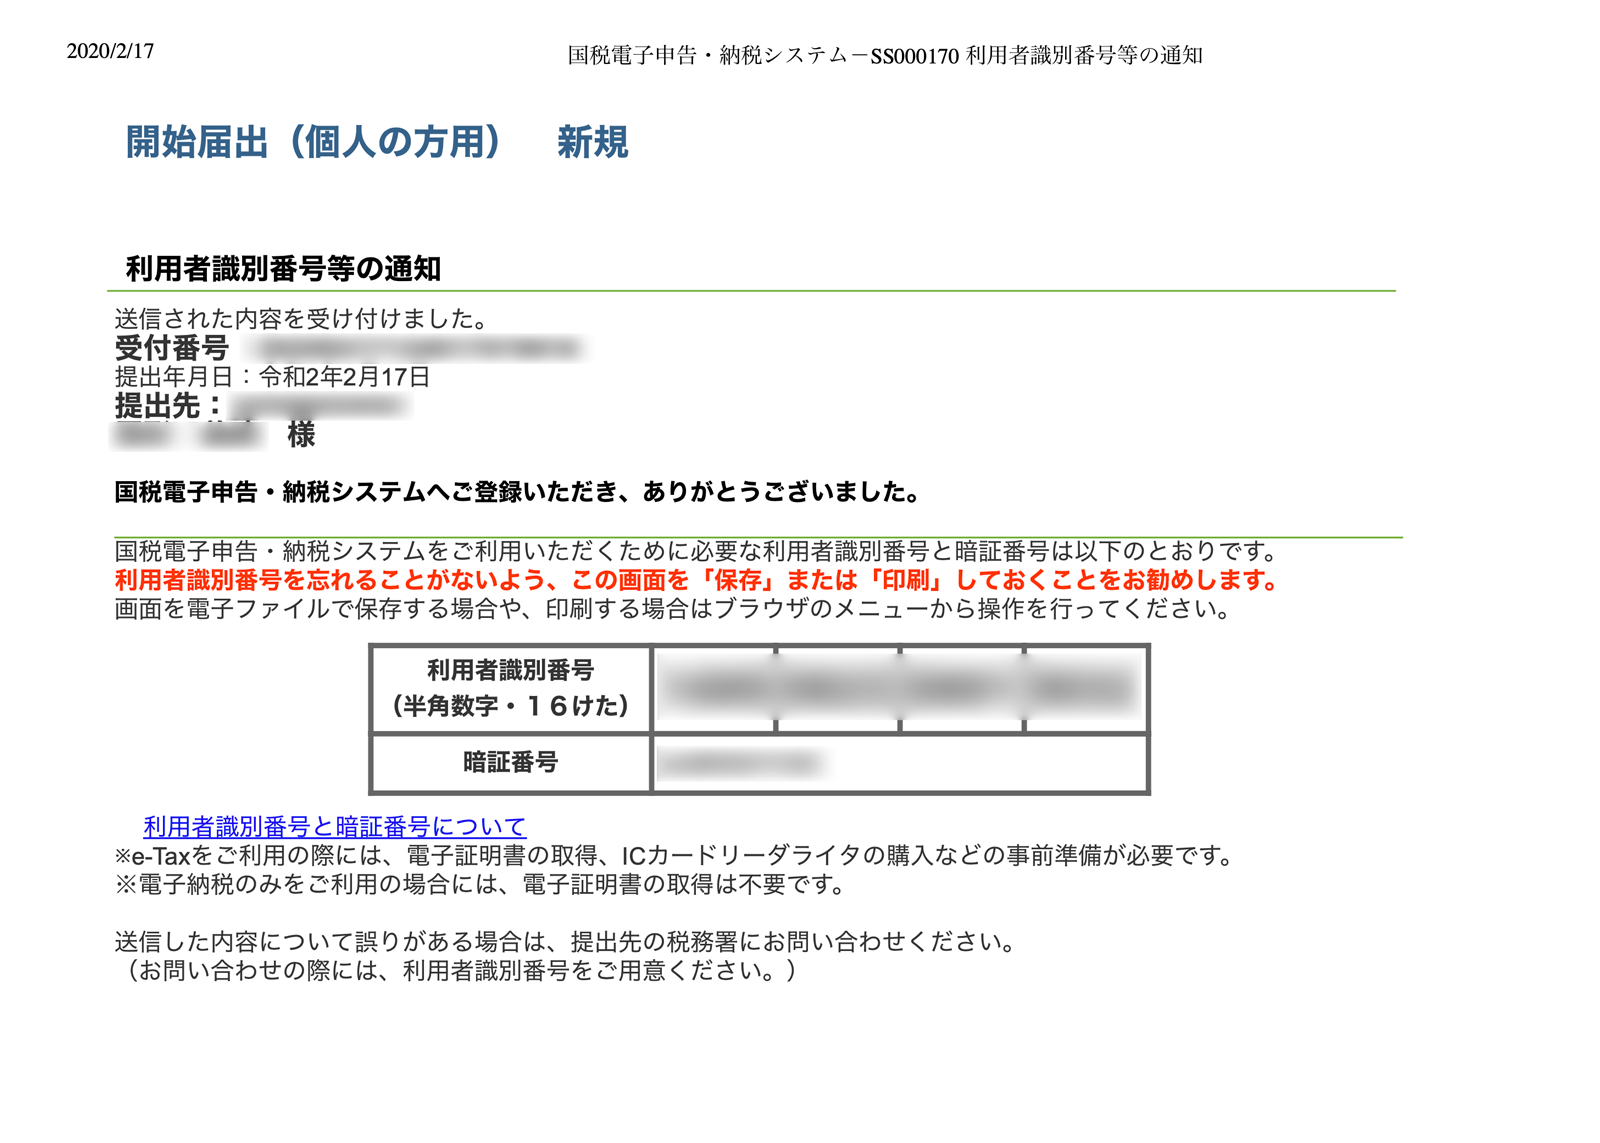 e-Taxの開始届出を提出して利用者識別番号と暗証番号